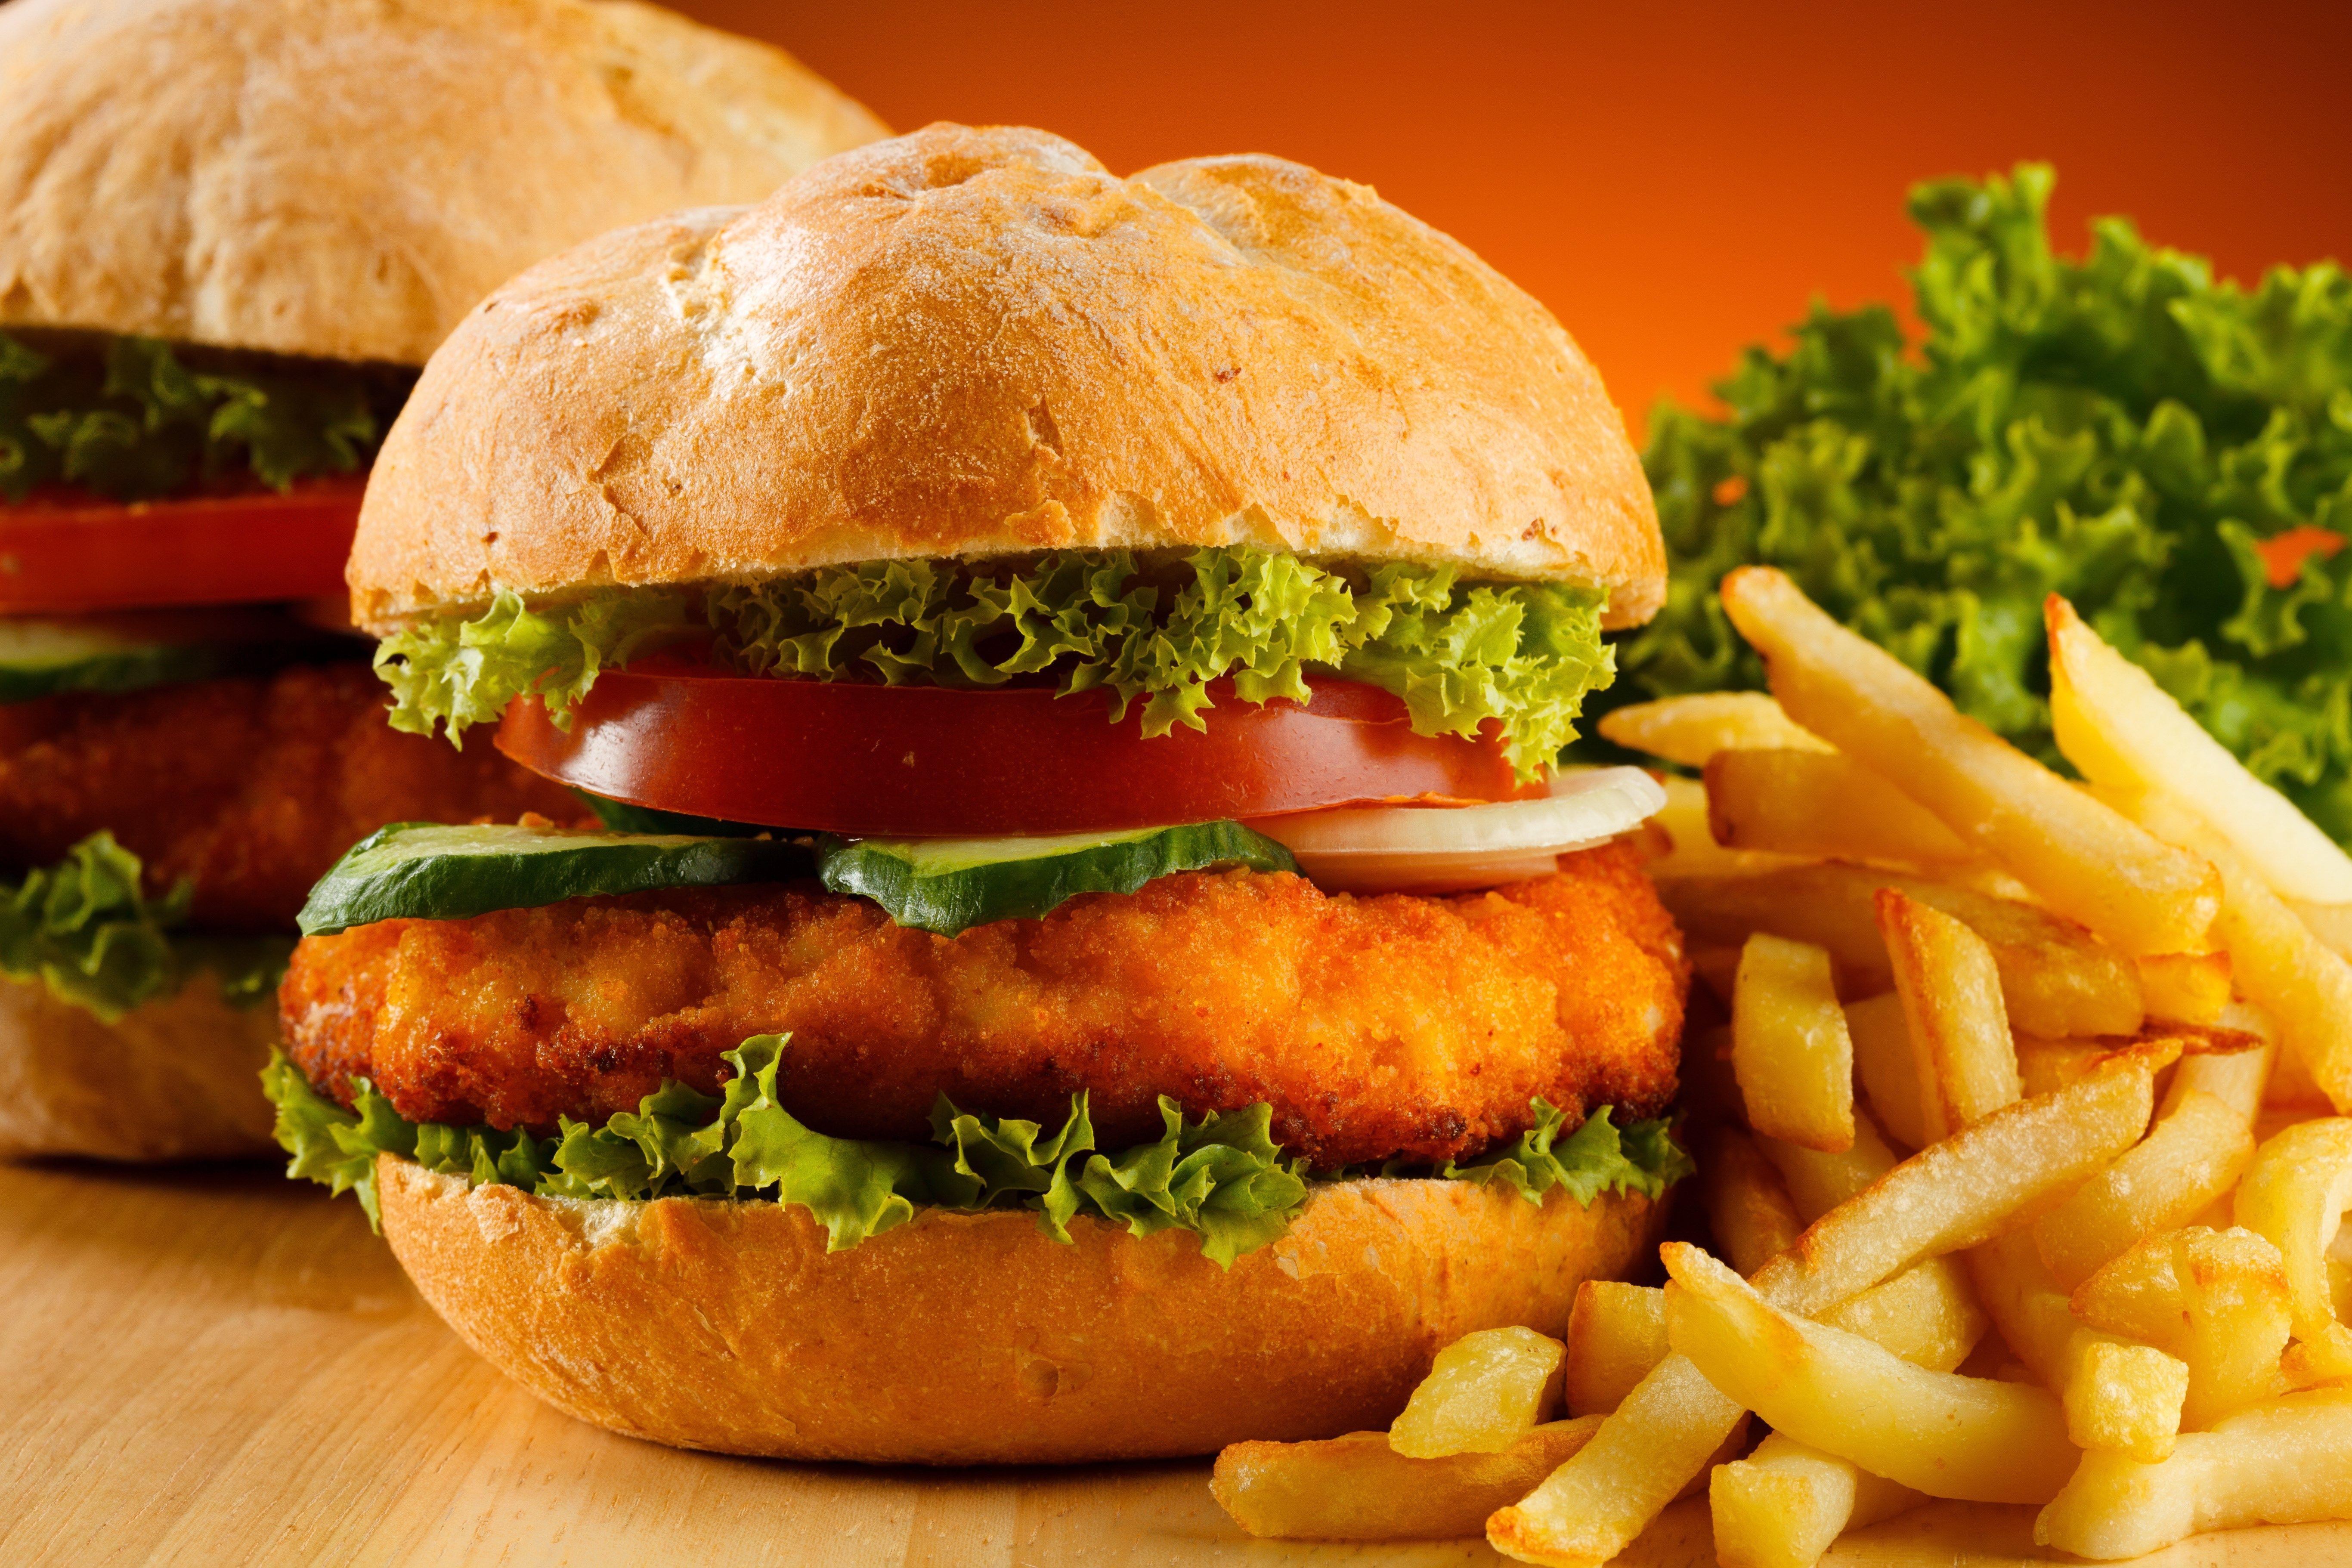 Good Wallpaper High Quality Burger - 556a79233d08d36de7e3e70a8104e2e6  Picture_552947.jpg